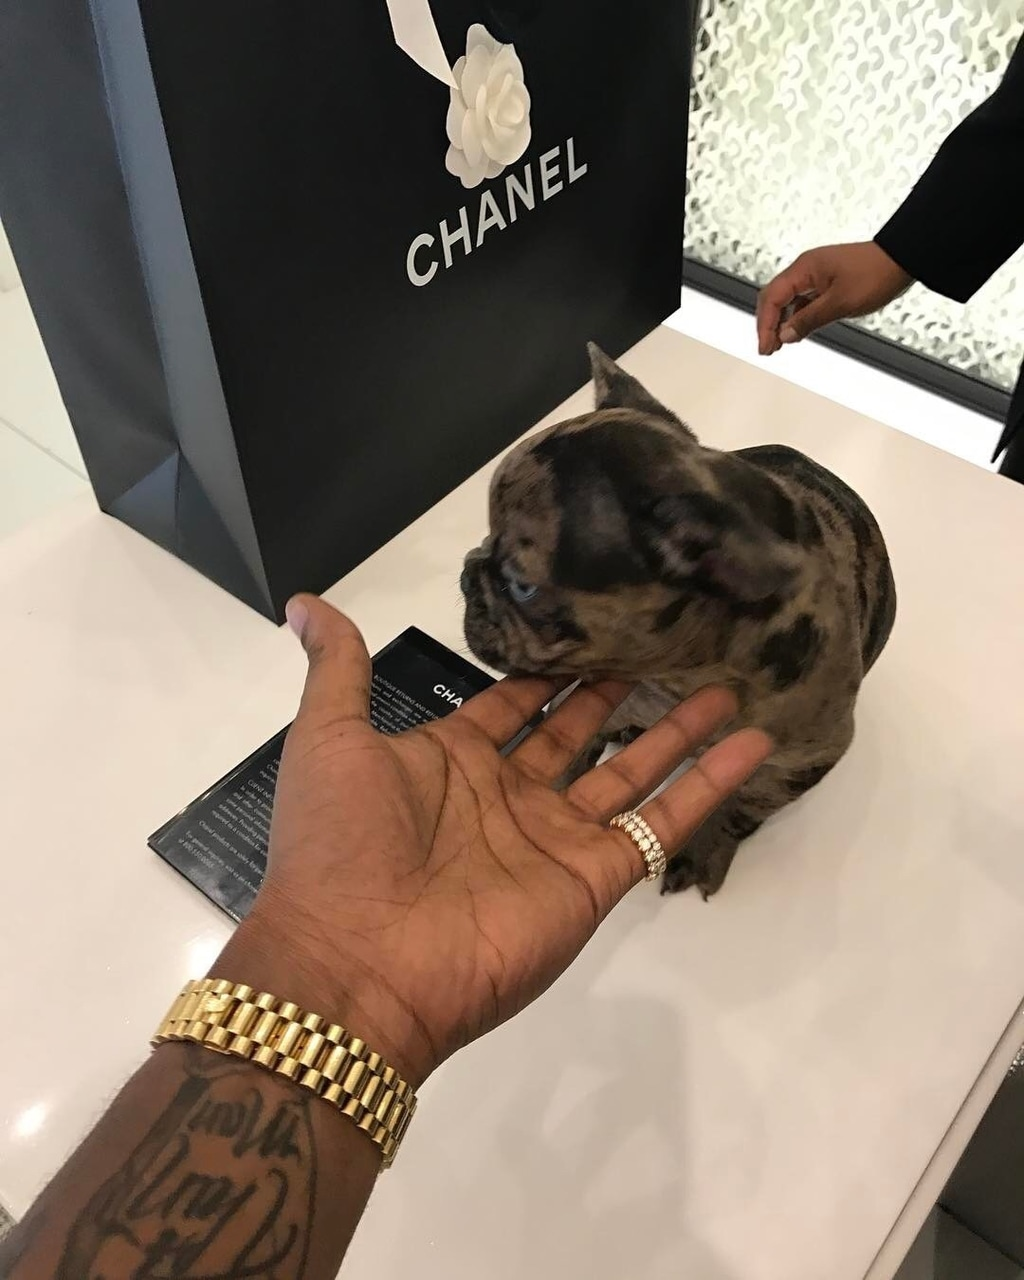 chanel and dog image